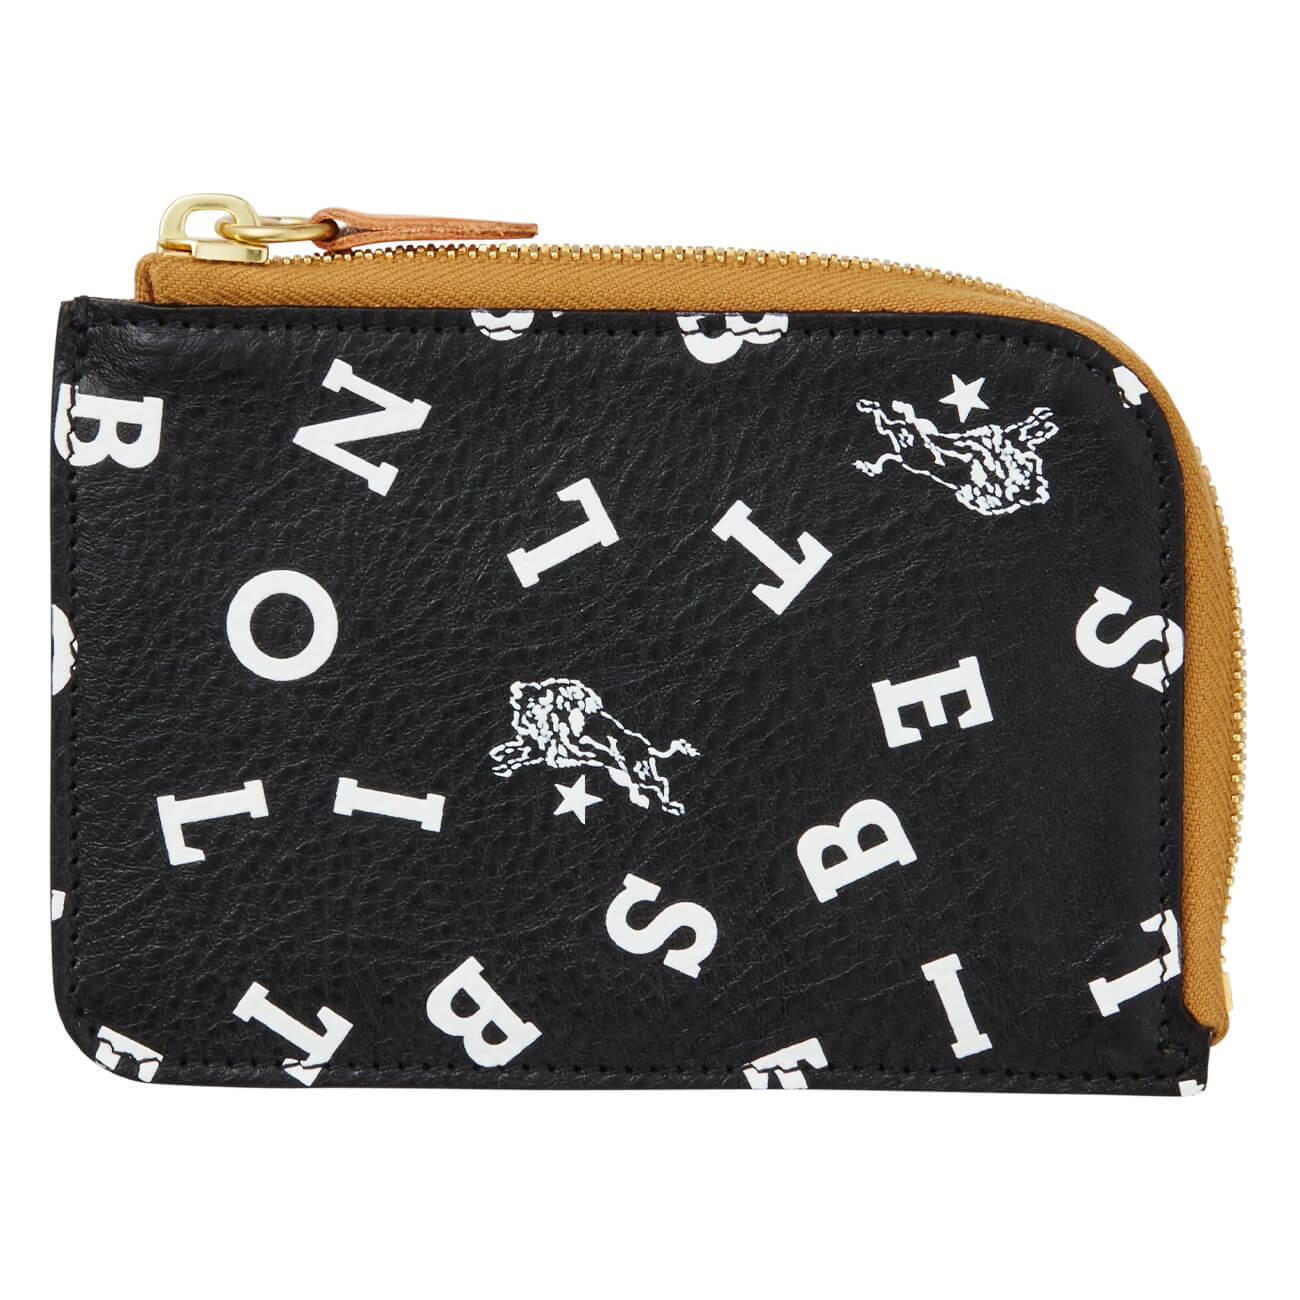 IL BISONTE (イル ビゾンテ) 日本公式オンラインストア 財布 54192312140